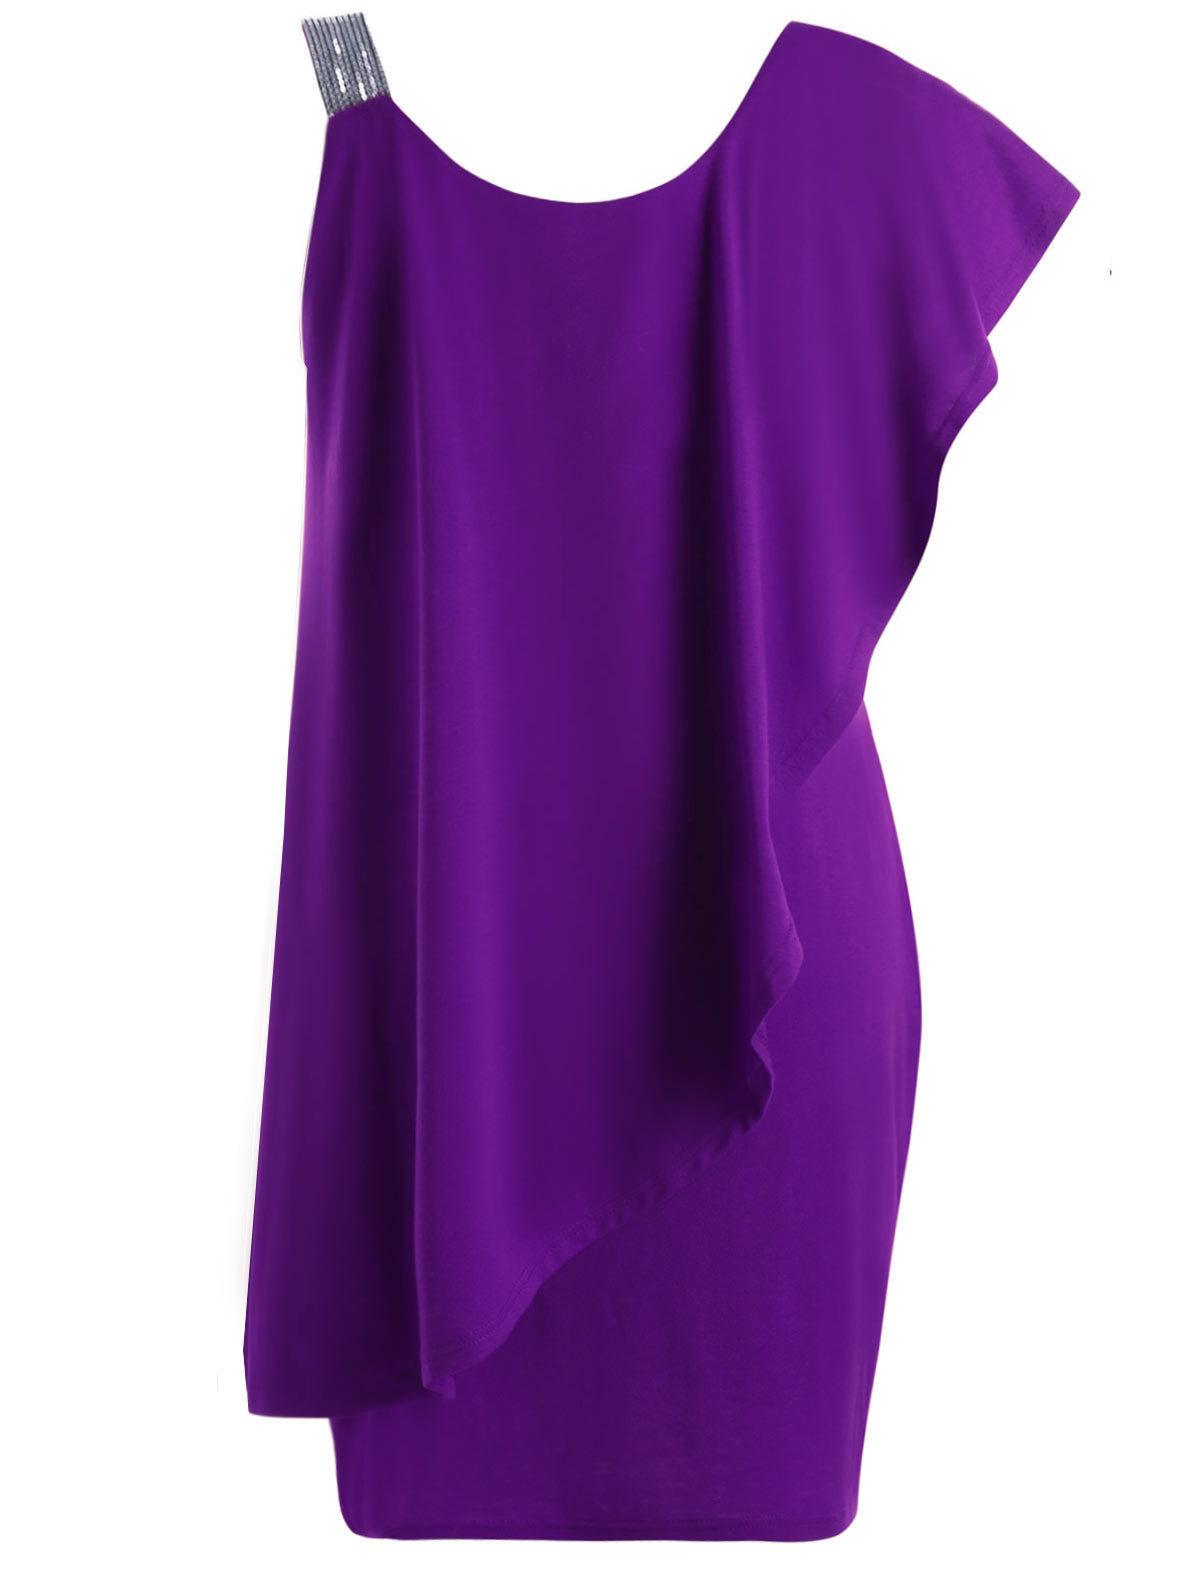 Plus Size Ruffles Sequins One Shoulder Mini Dress Women Summer Party Dress Sexy Bodycon Dresses Vestido Robes 5xl designer clothes